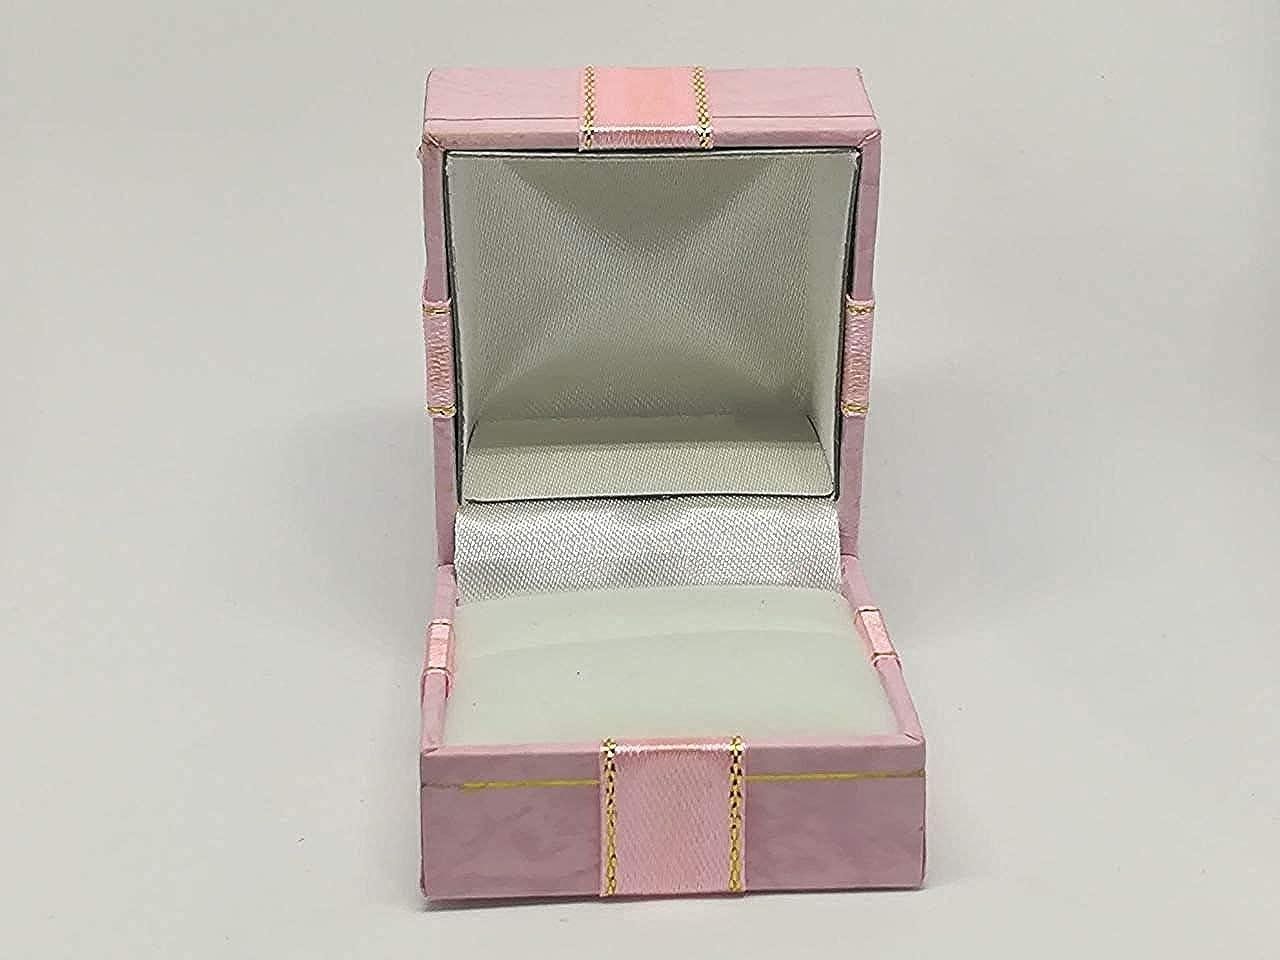 Dividiamonds 14k White Gold Finish 925 Sterling Full Eternity Wedding Anniversary Band with Sim Diamond